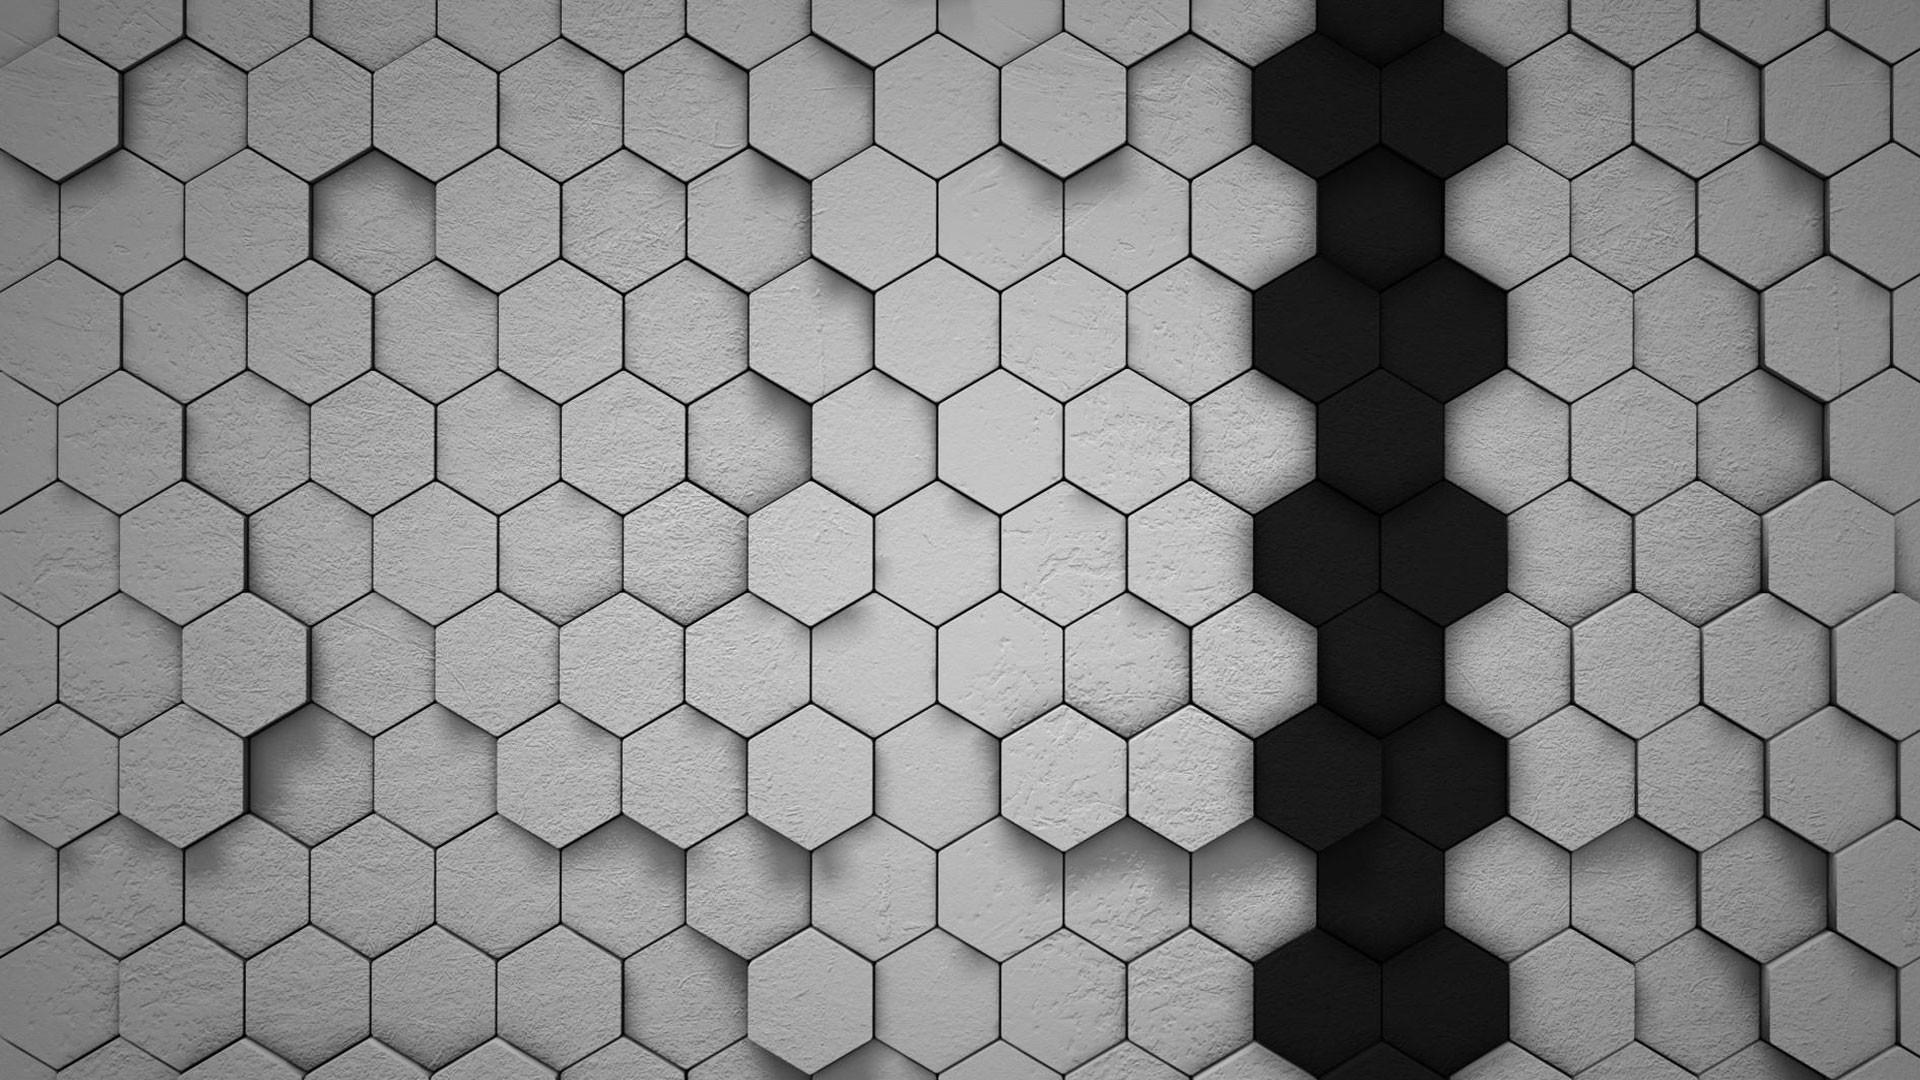 hd pics photos beautiful 3d polygon pattern gray black hexagon hd quality  desktop background wallpaper